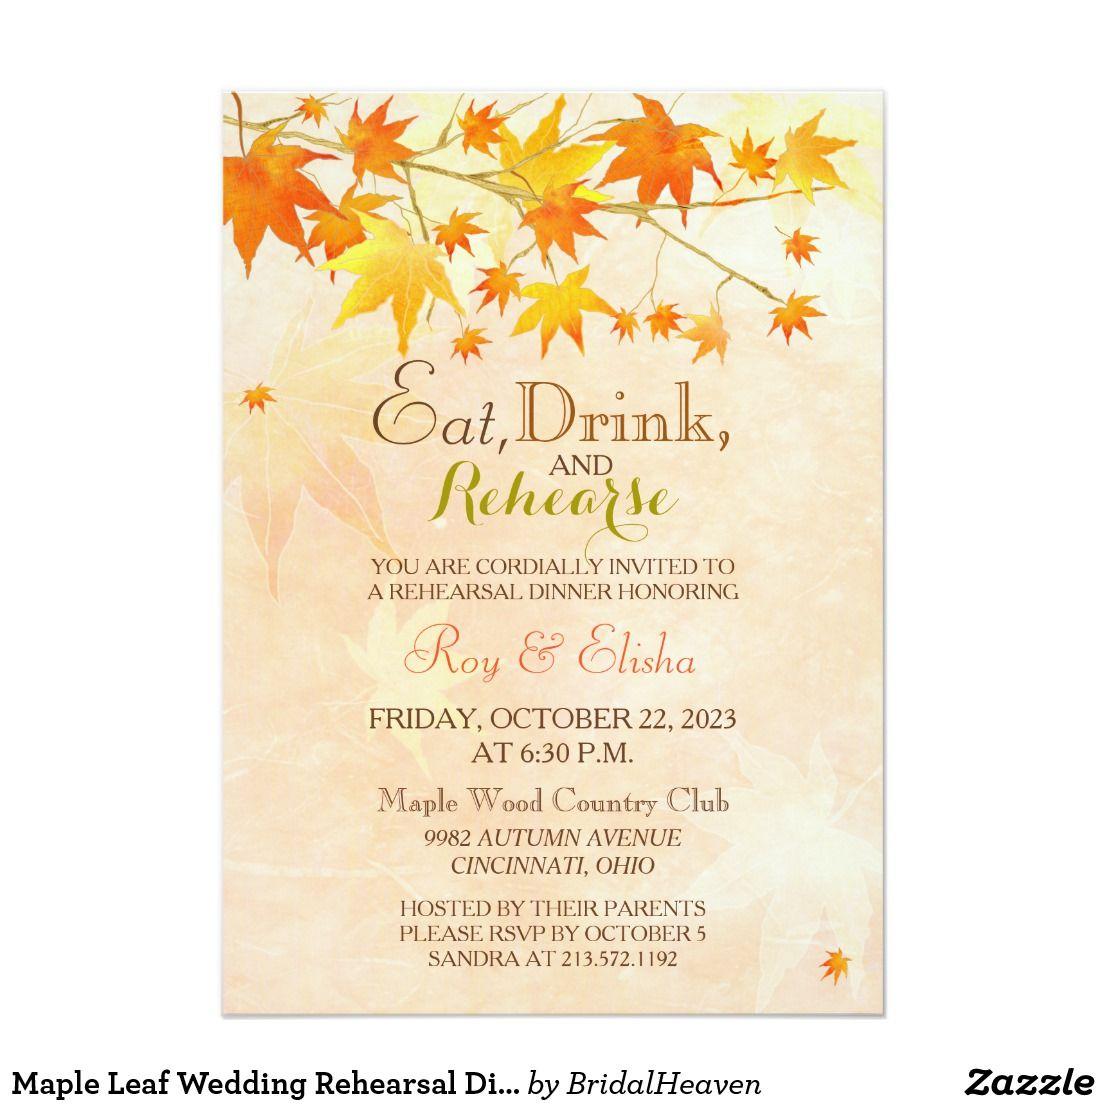 Maple Leaf Wedding Rehearsal Dinner Card Lovely autumn maple leaves ...